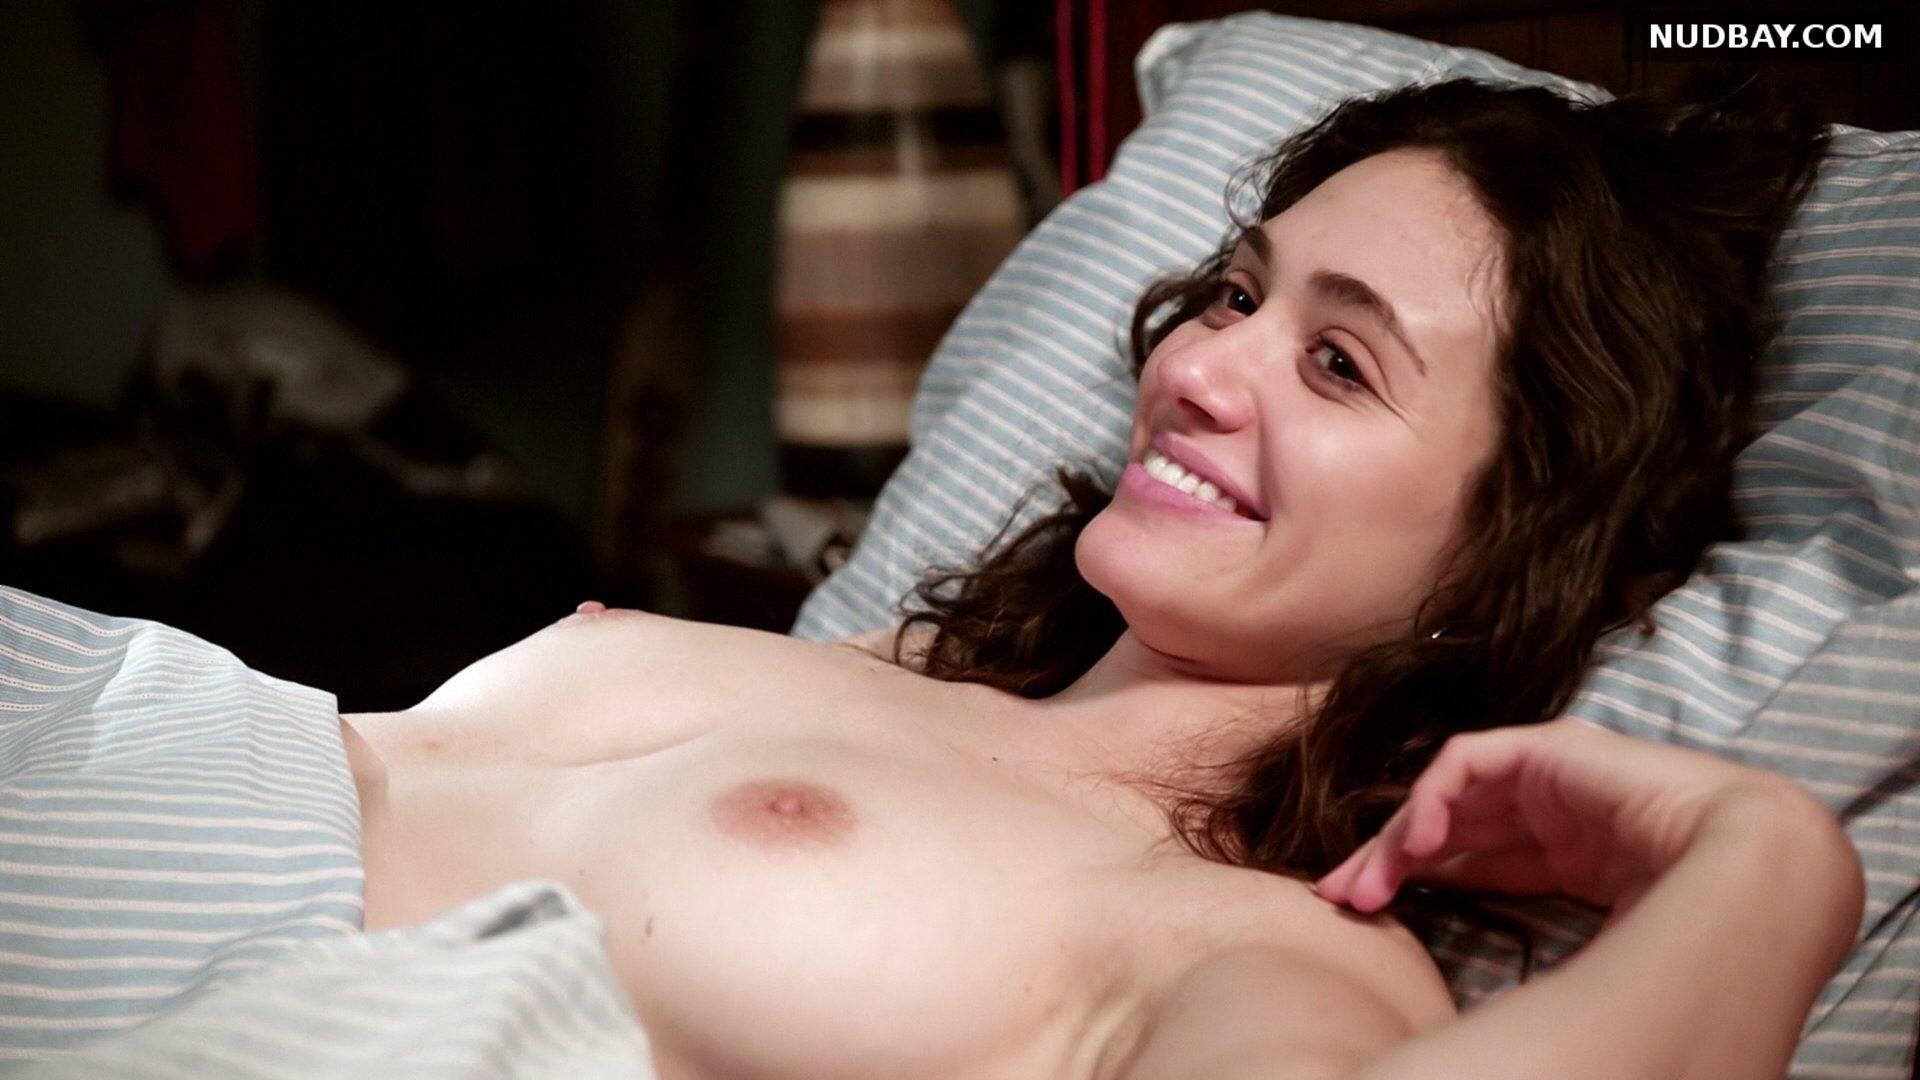 Emmy Rossum Nude in Shameless 05